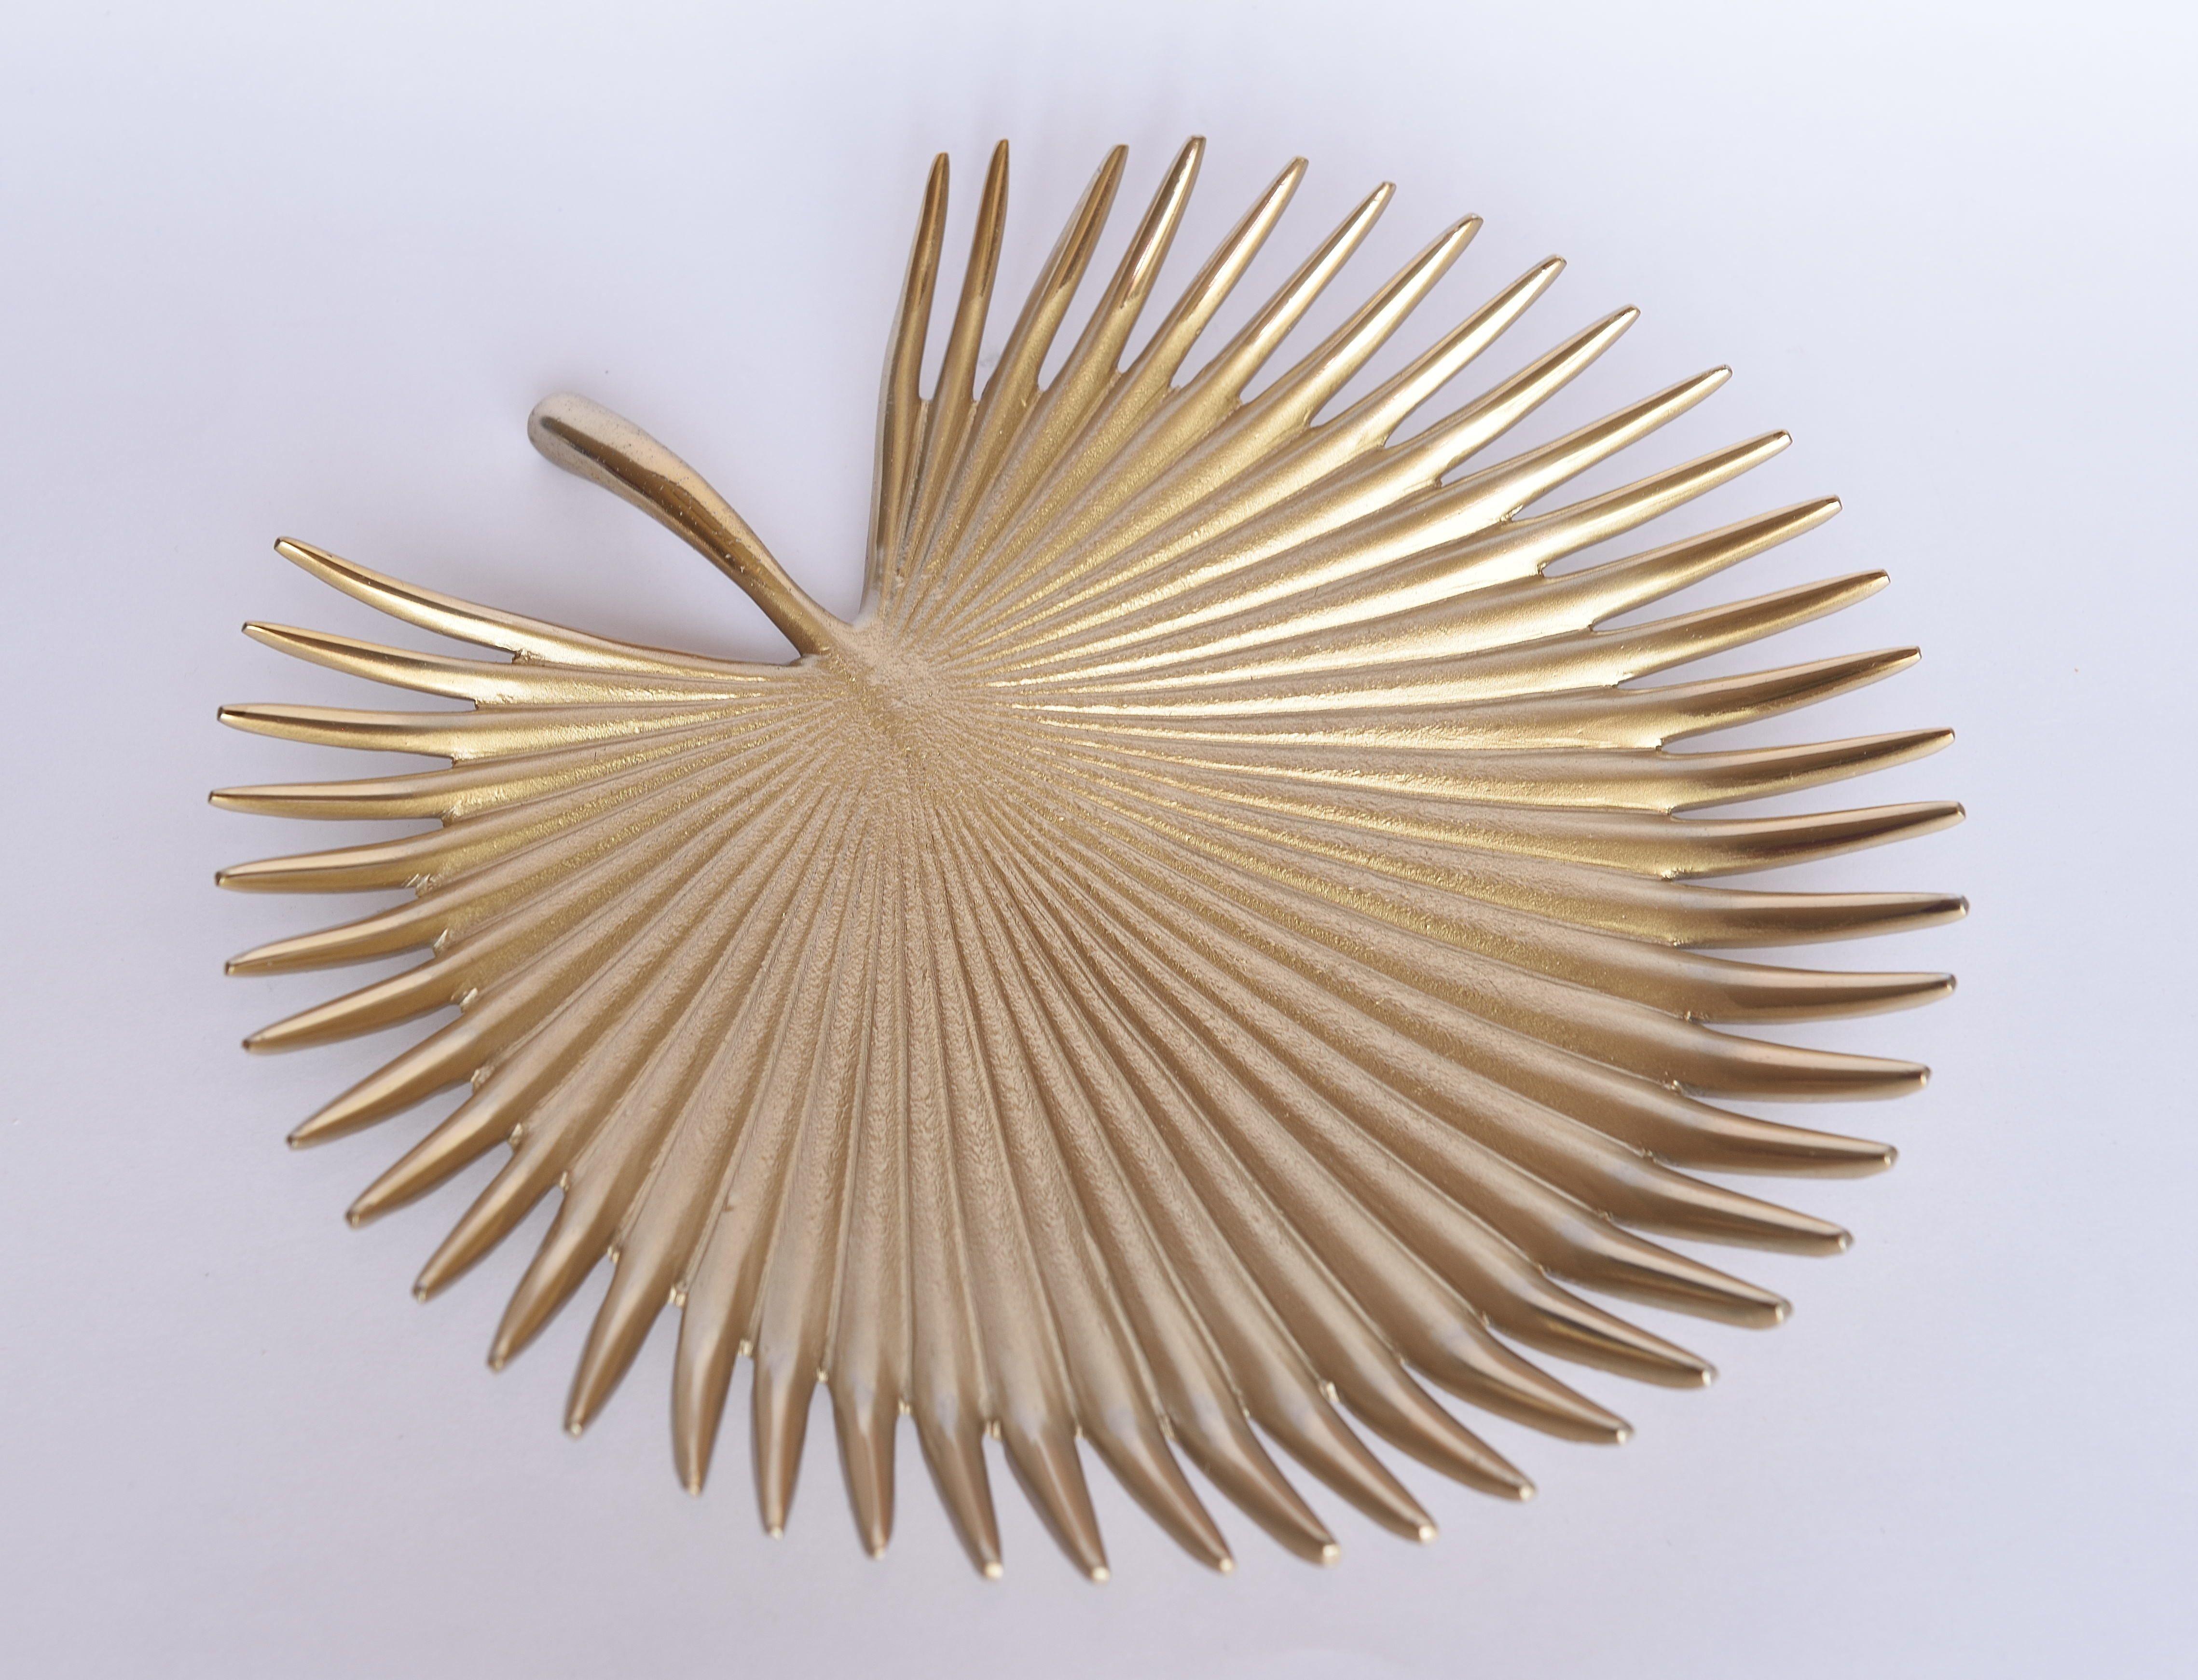 Daamisha designer serving bowl and platter is made of